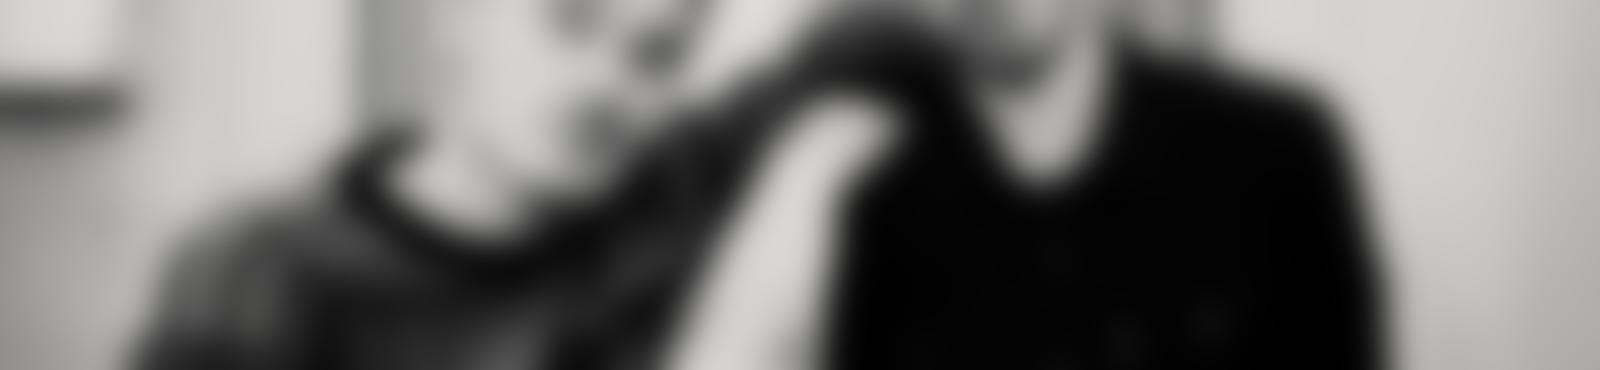 Blurred 23c69c7a cf8a 4f3a 9f06 4fc9413f677a